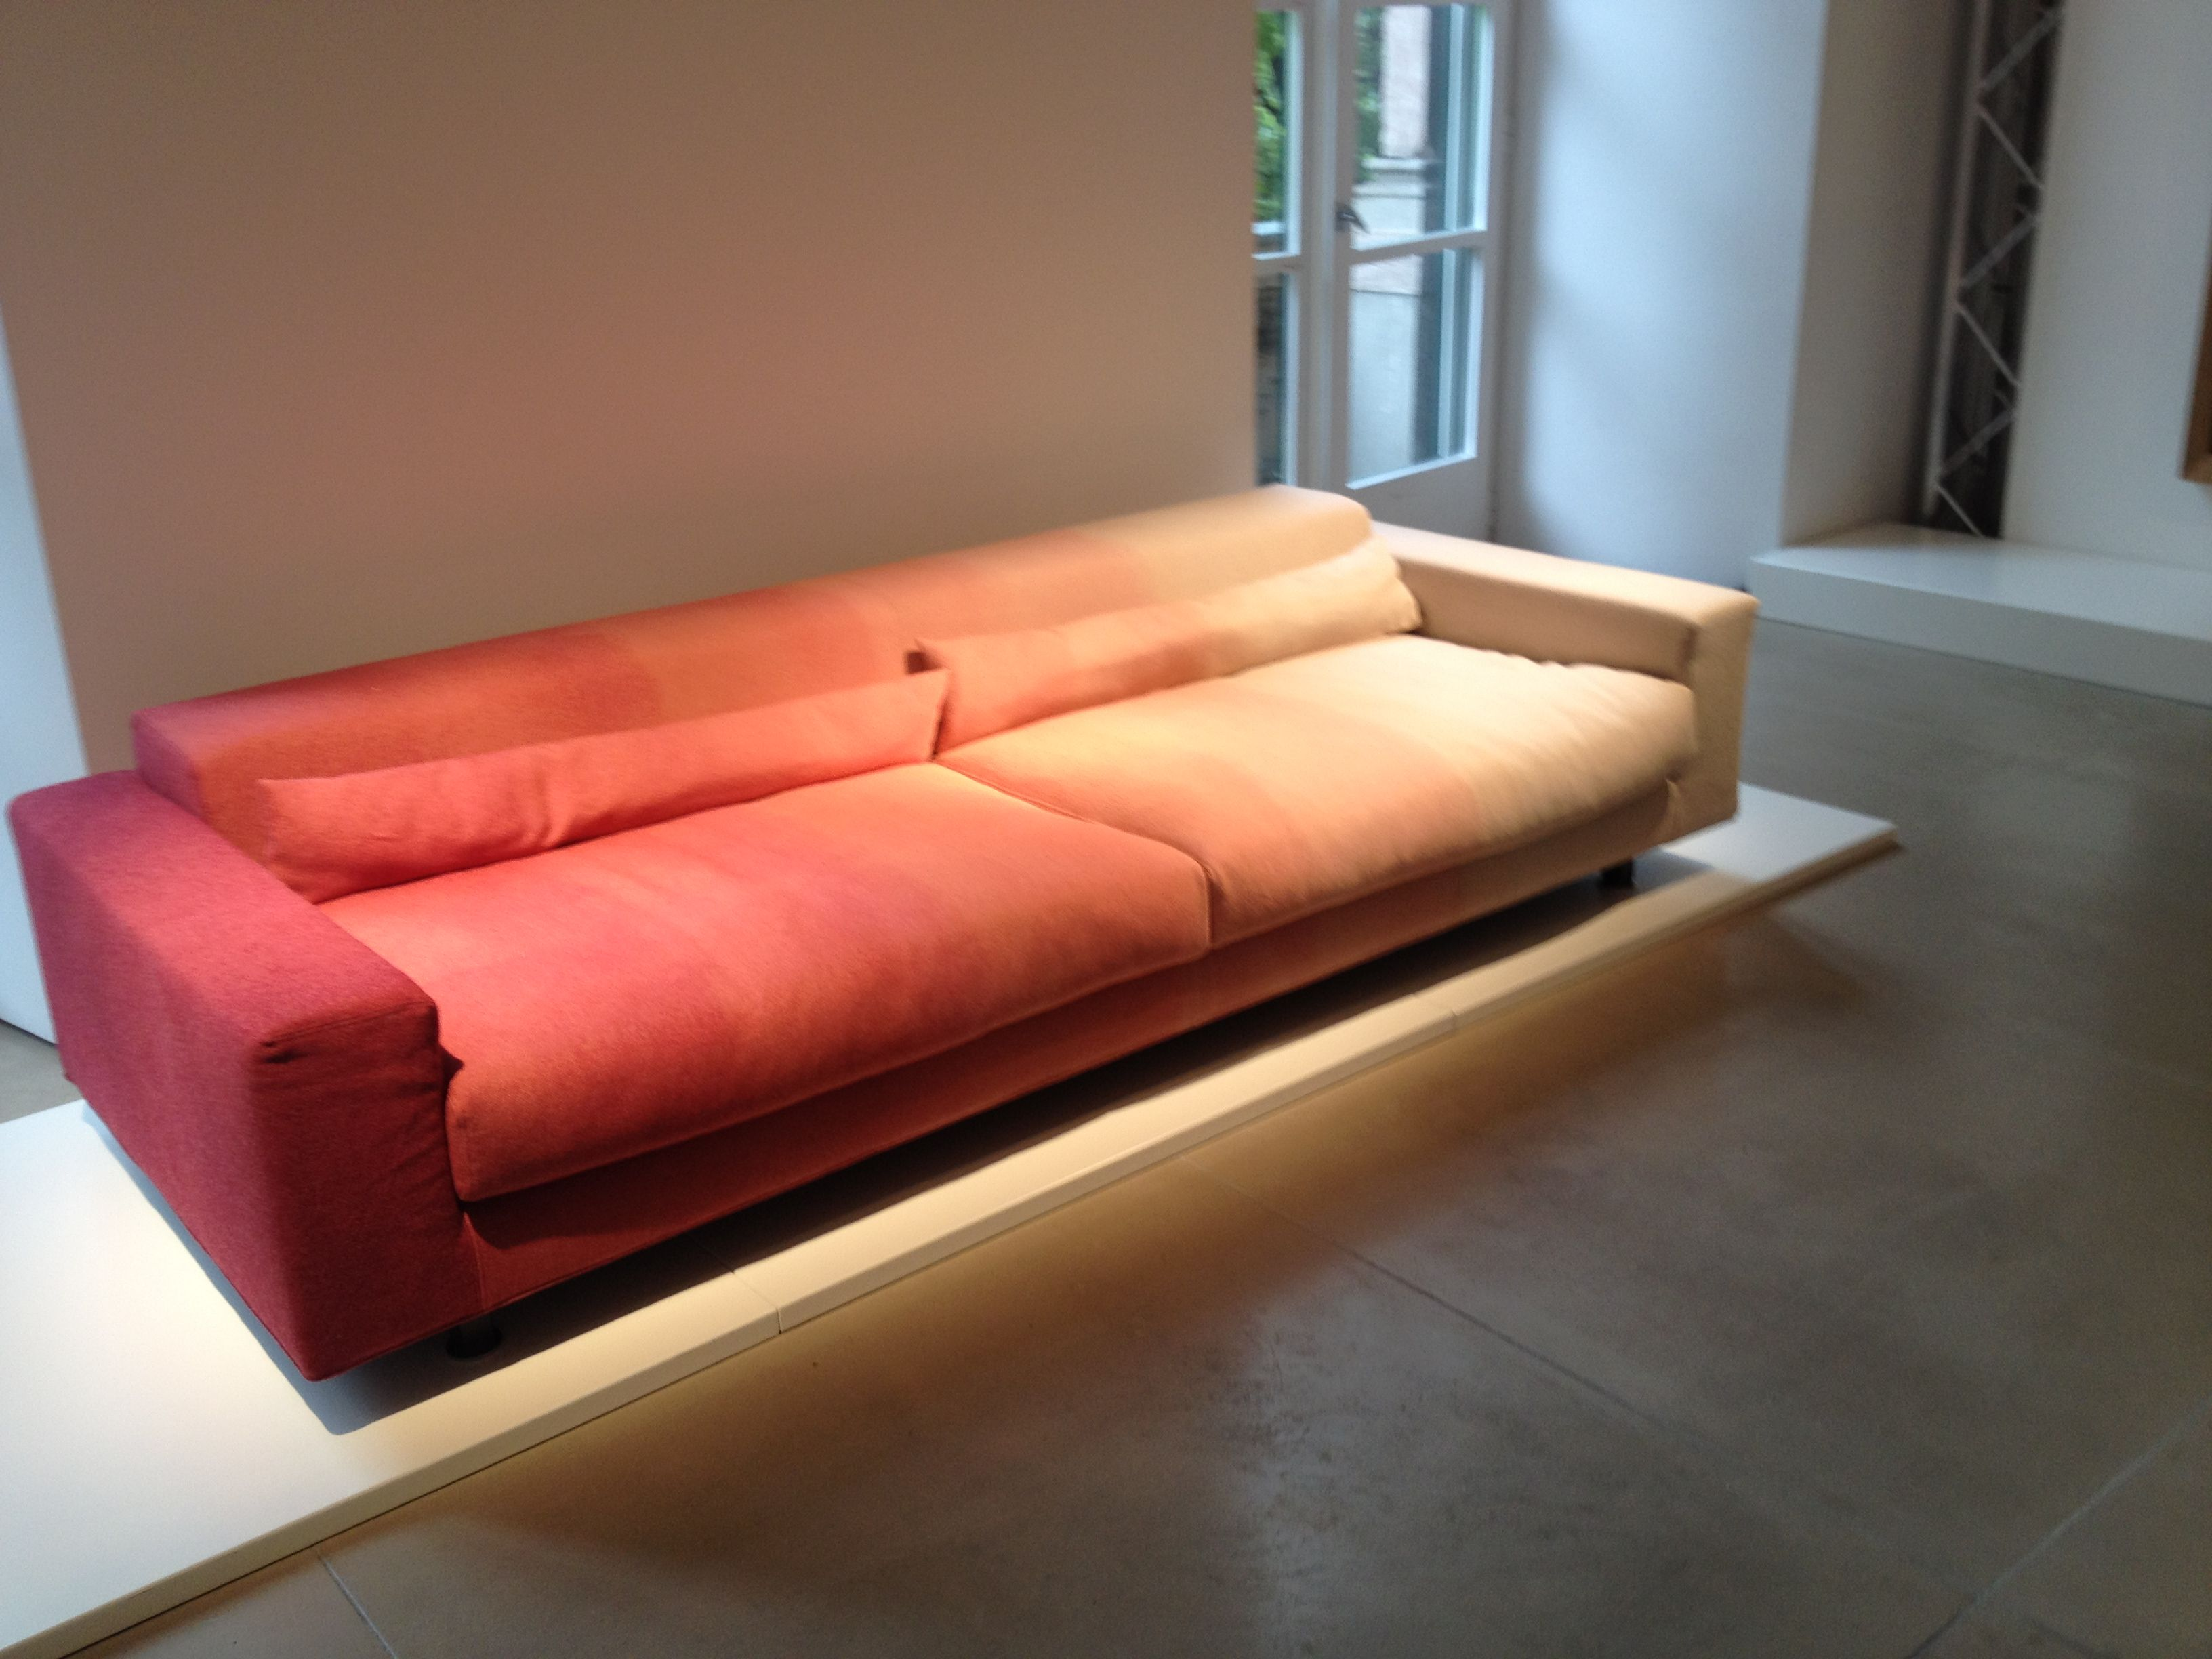 Mobili moroso ~ Moroso blur sofa and mark table by marc thorpe wanteddesign may